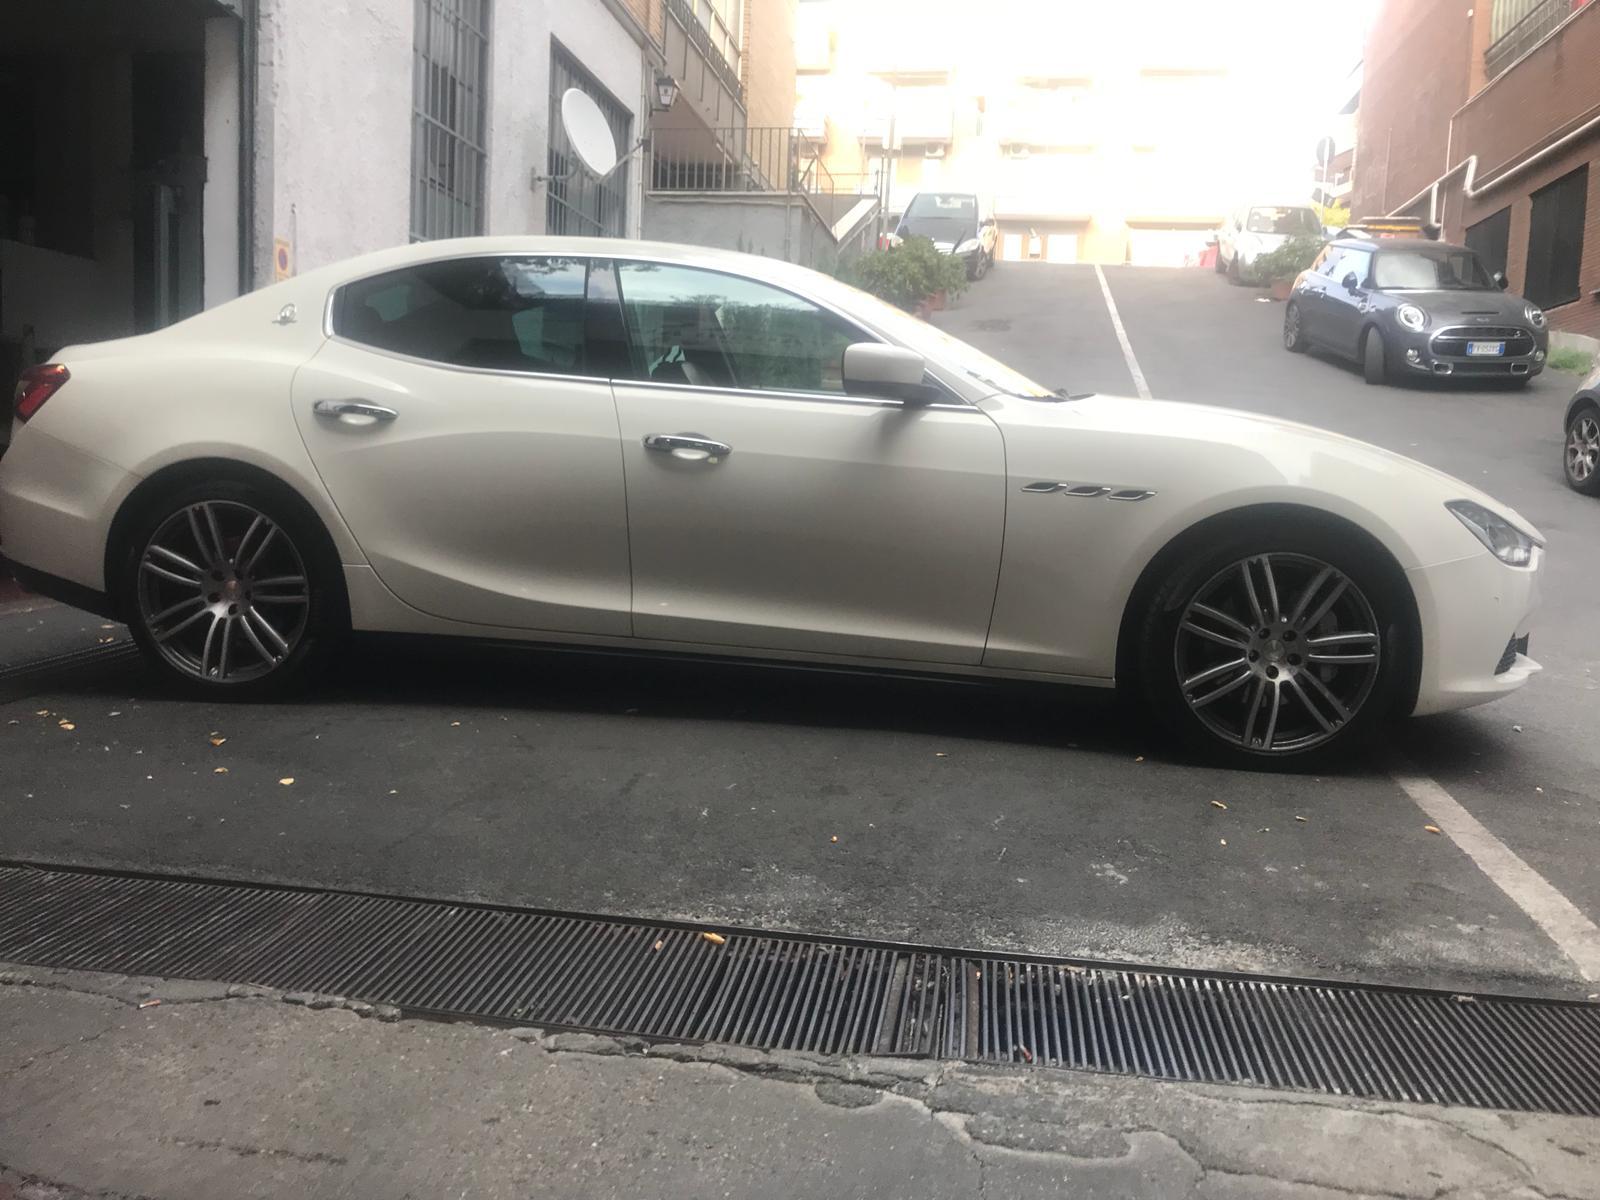 Maserati Ghibli - Noleggio auto matrimoni Roma - maserati matrimoni Roma - noleggio Maserati matrimoni - noleggio auto roma - auto matrimoni Roma - Noleggio Auto matrimoni - nozze auto - auto matrimonio Roma